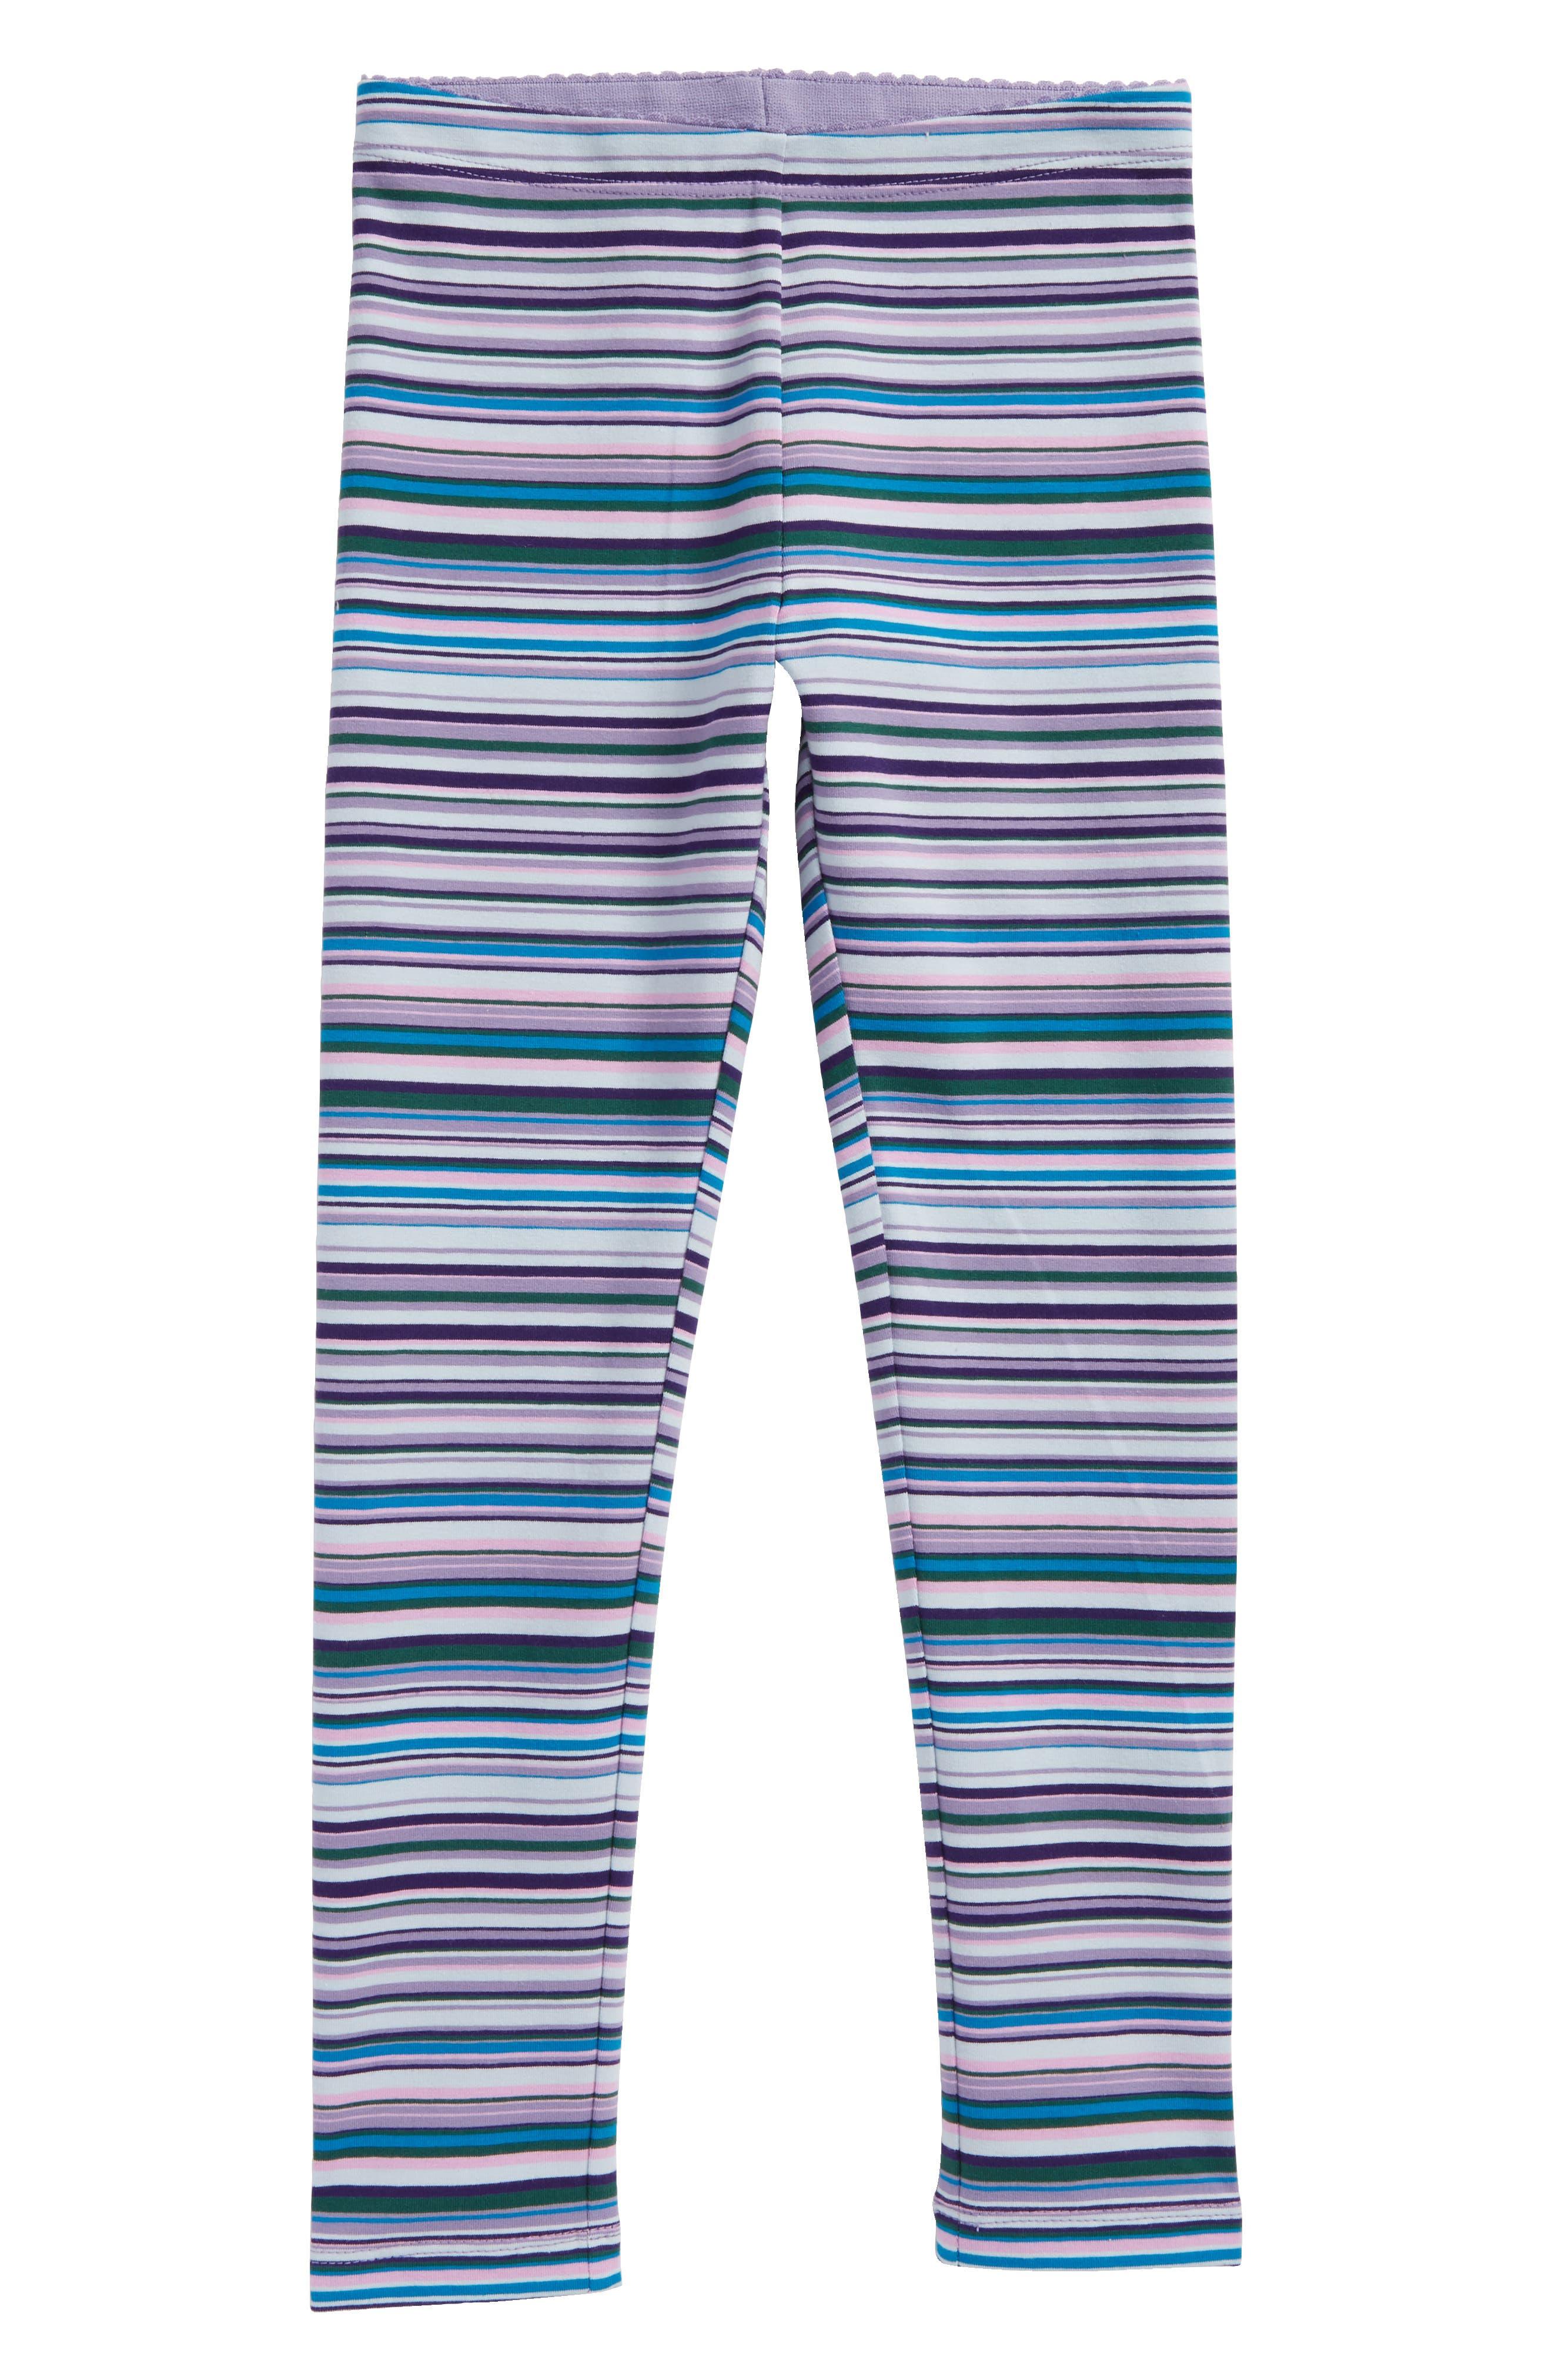 Main Image - Tea Collection Multistripe Leggings (Toddler Girls, Little Girls & Big Girls)